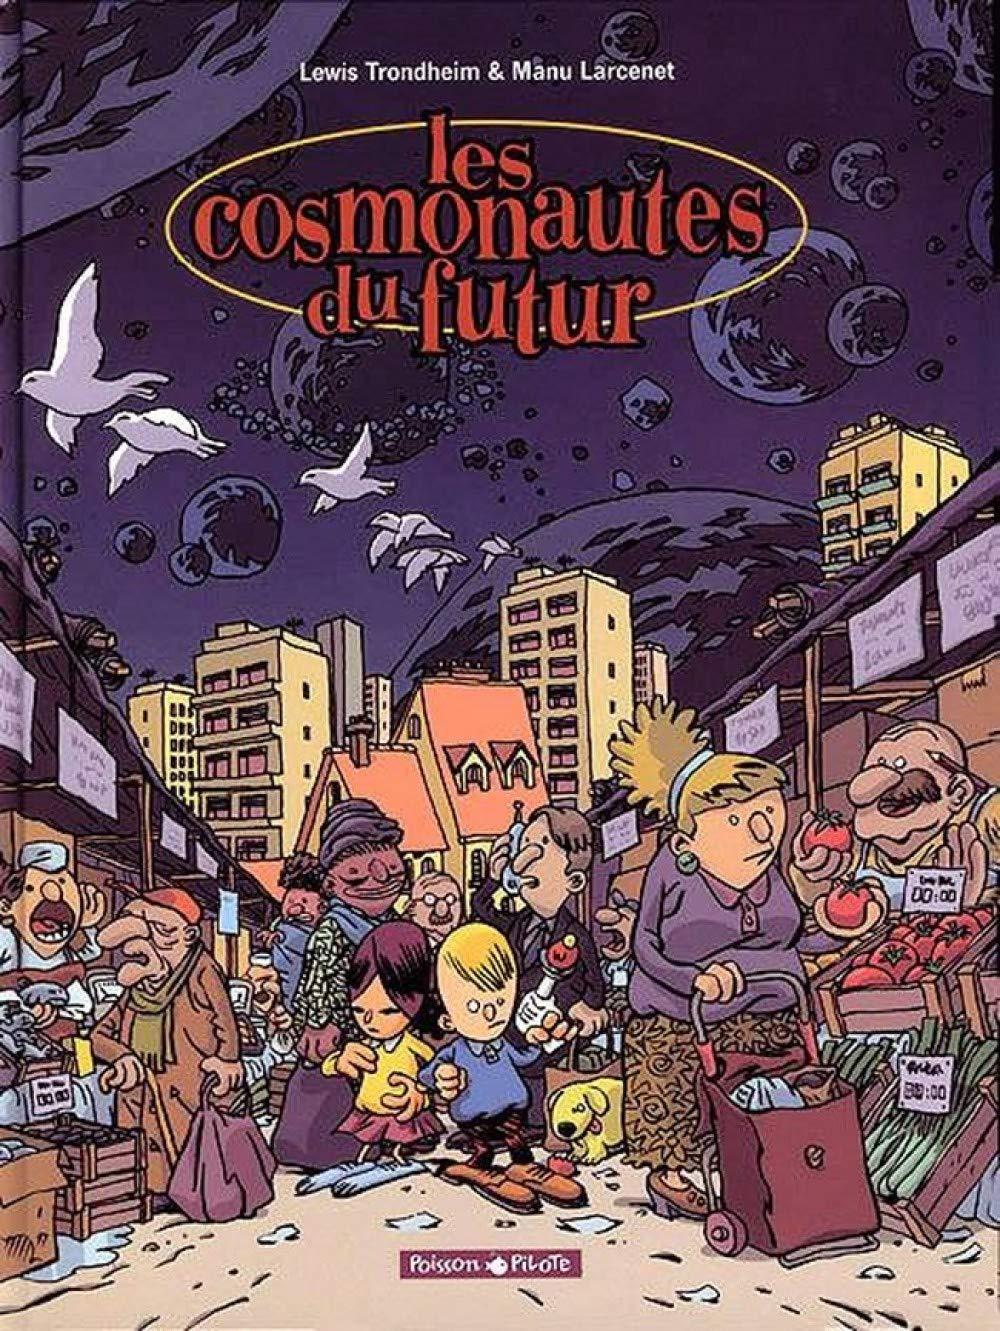 Les Cosmonautes Du Futur Tome 1 Les Cosmonautes Du Futur Poisson Pilote French Edition Trondheim Larcenet Manu 9782205049138 Amazon Com Books